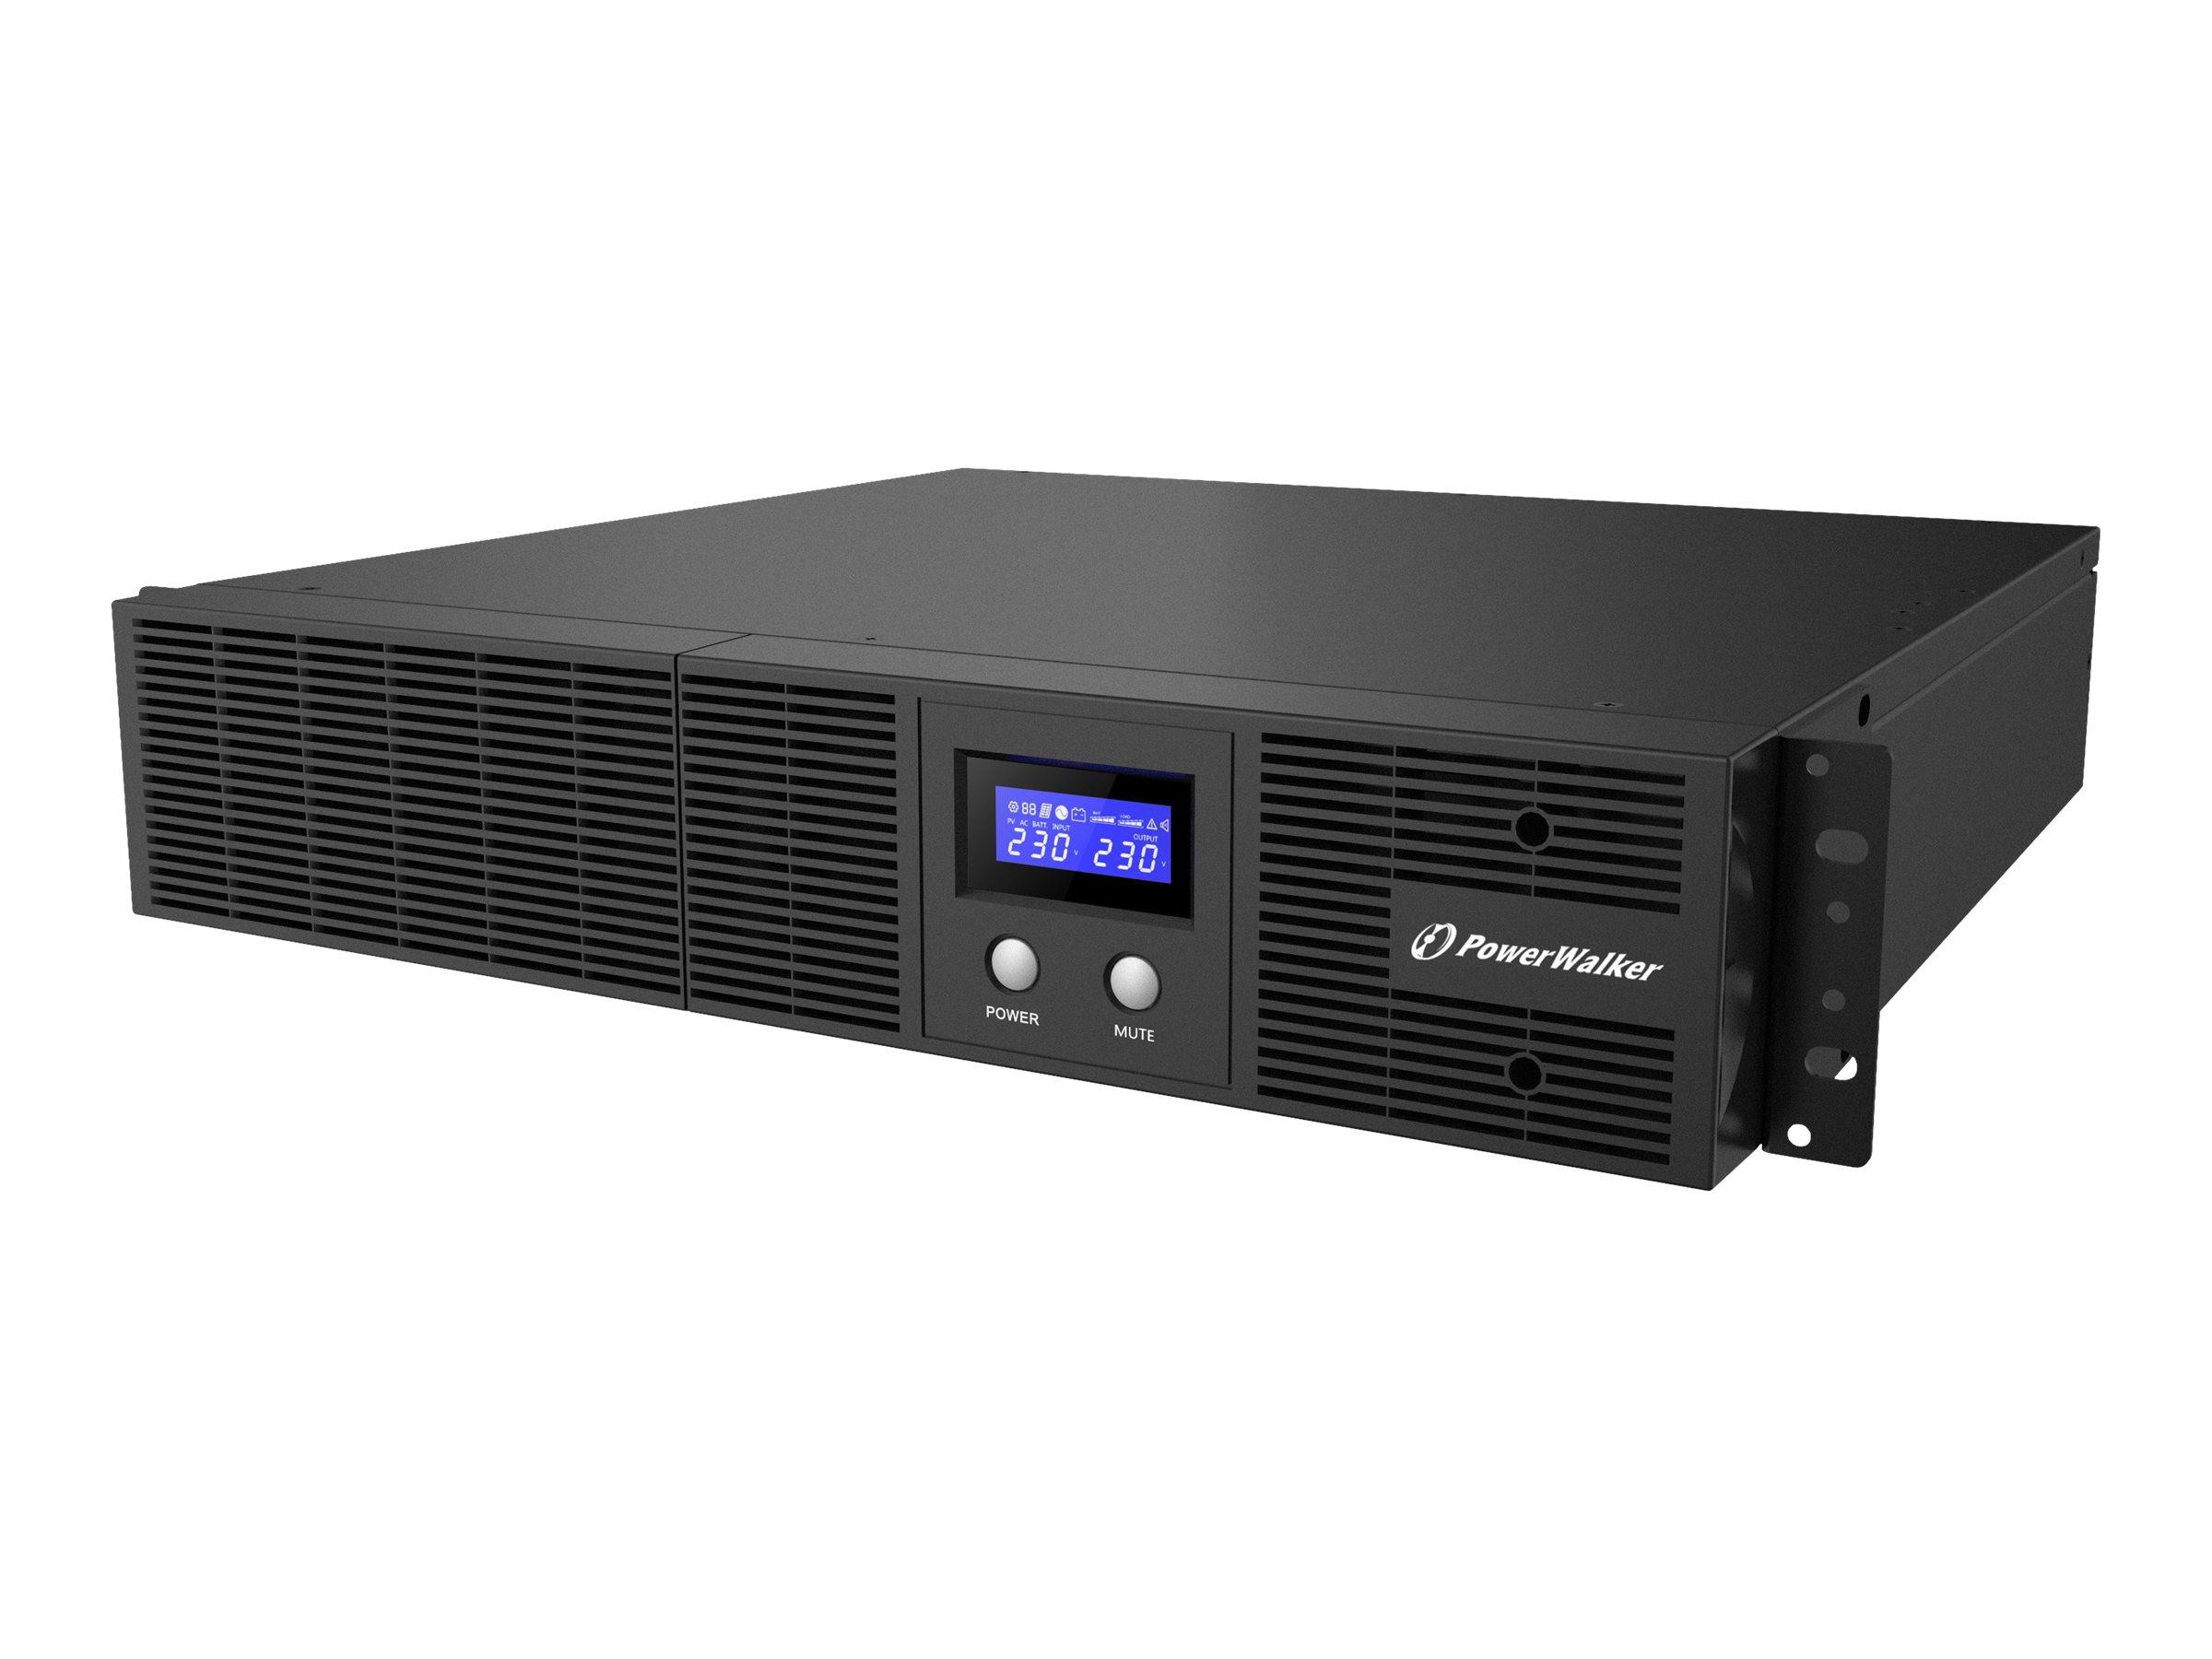 PowerWalker VI 3000 RLE - USV (Rack - einbaufähig) - Wechselstrom 230 V - 1800 Watt - 3000 VA 7.2 Ah